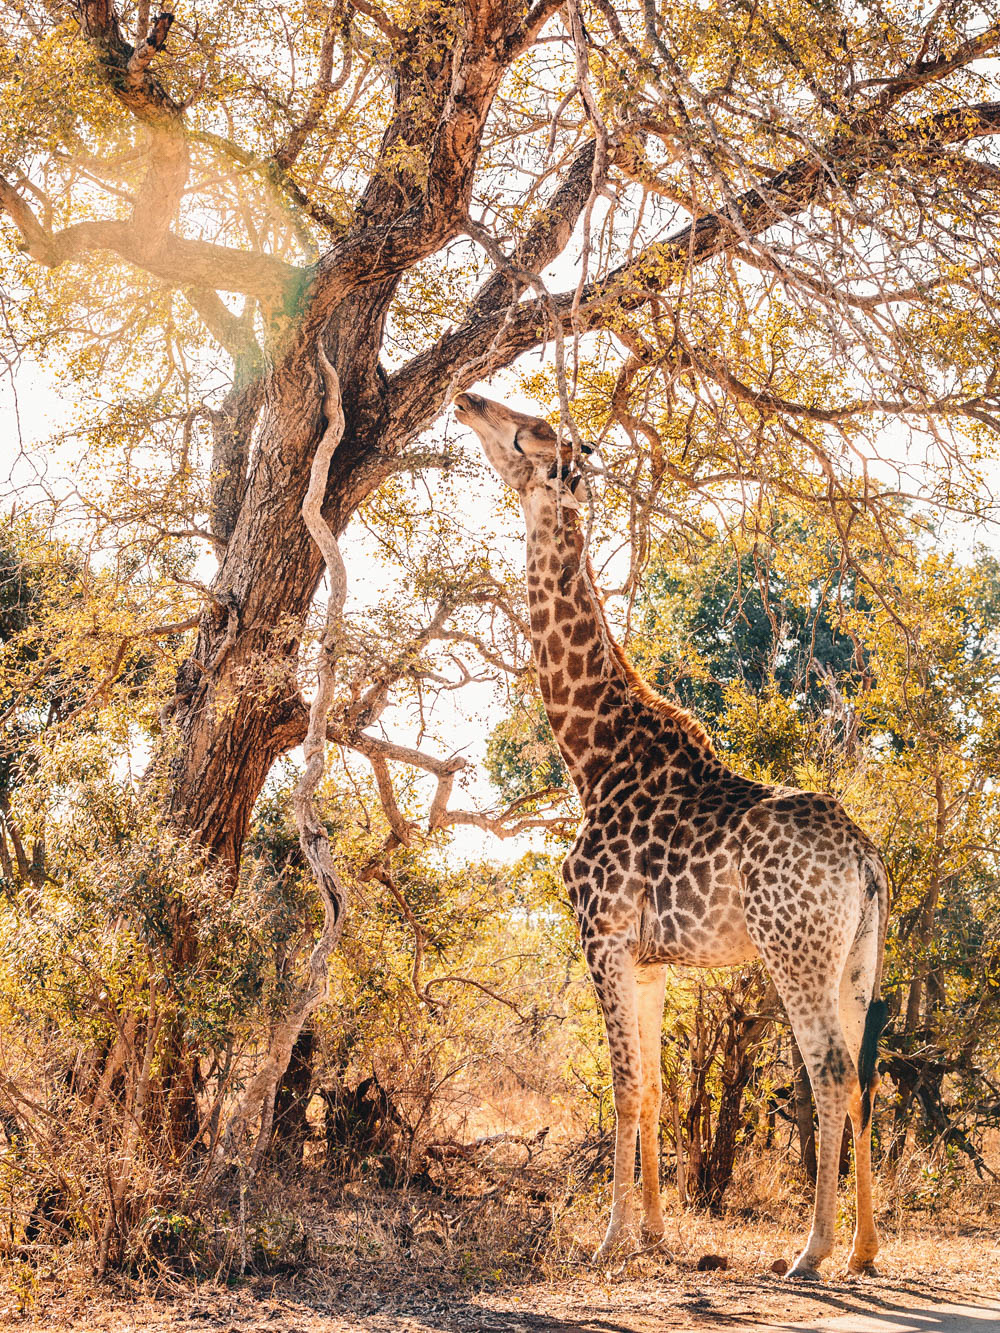 CallieGiovanna_Africa_SouthAfrica_KrugerNationalPark_20150701_5504.jpg